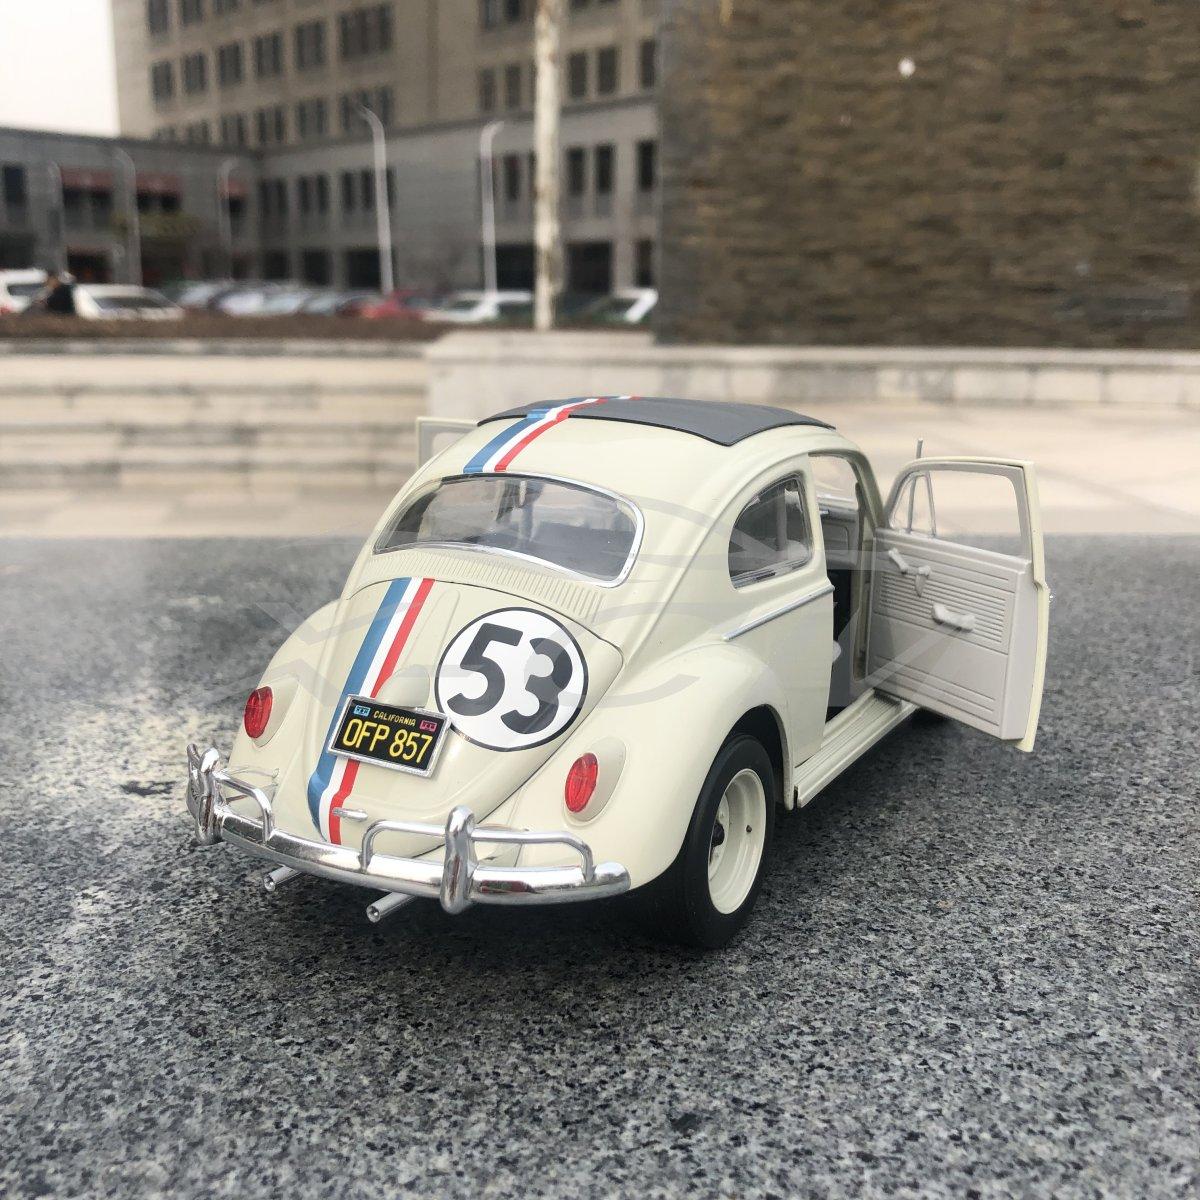 Hot Wheels 1:18 Volkswagen Beetle 53 Ghostbusters 53 # Alloy Car Model Accessories